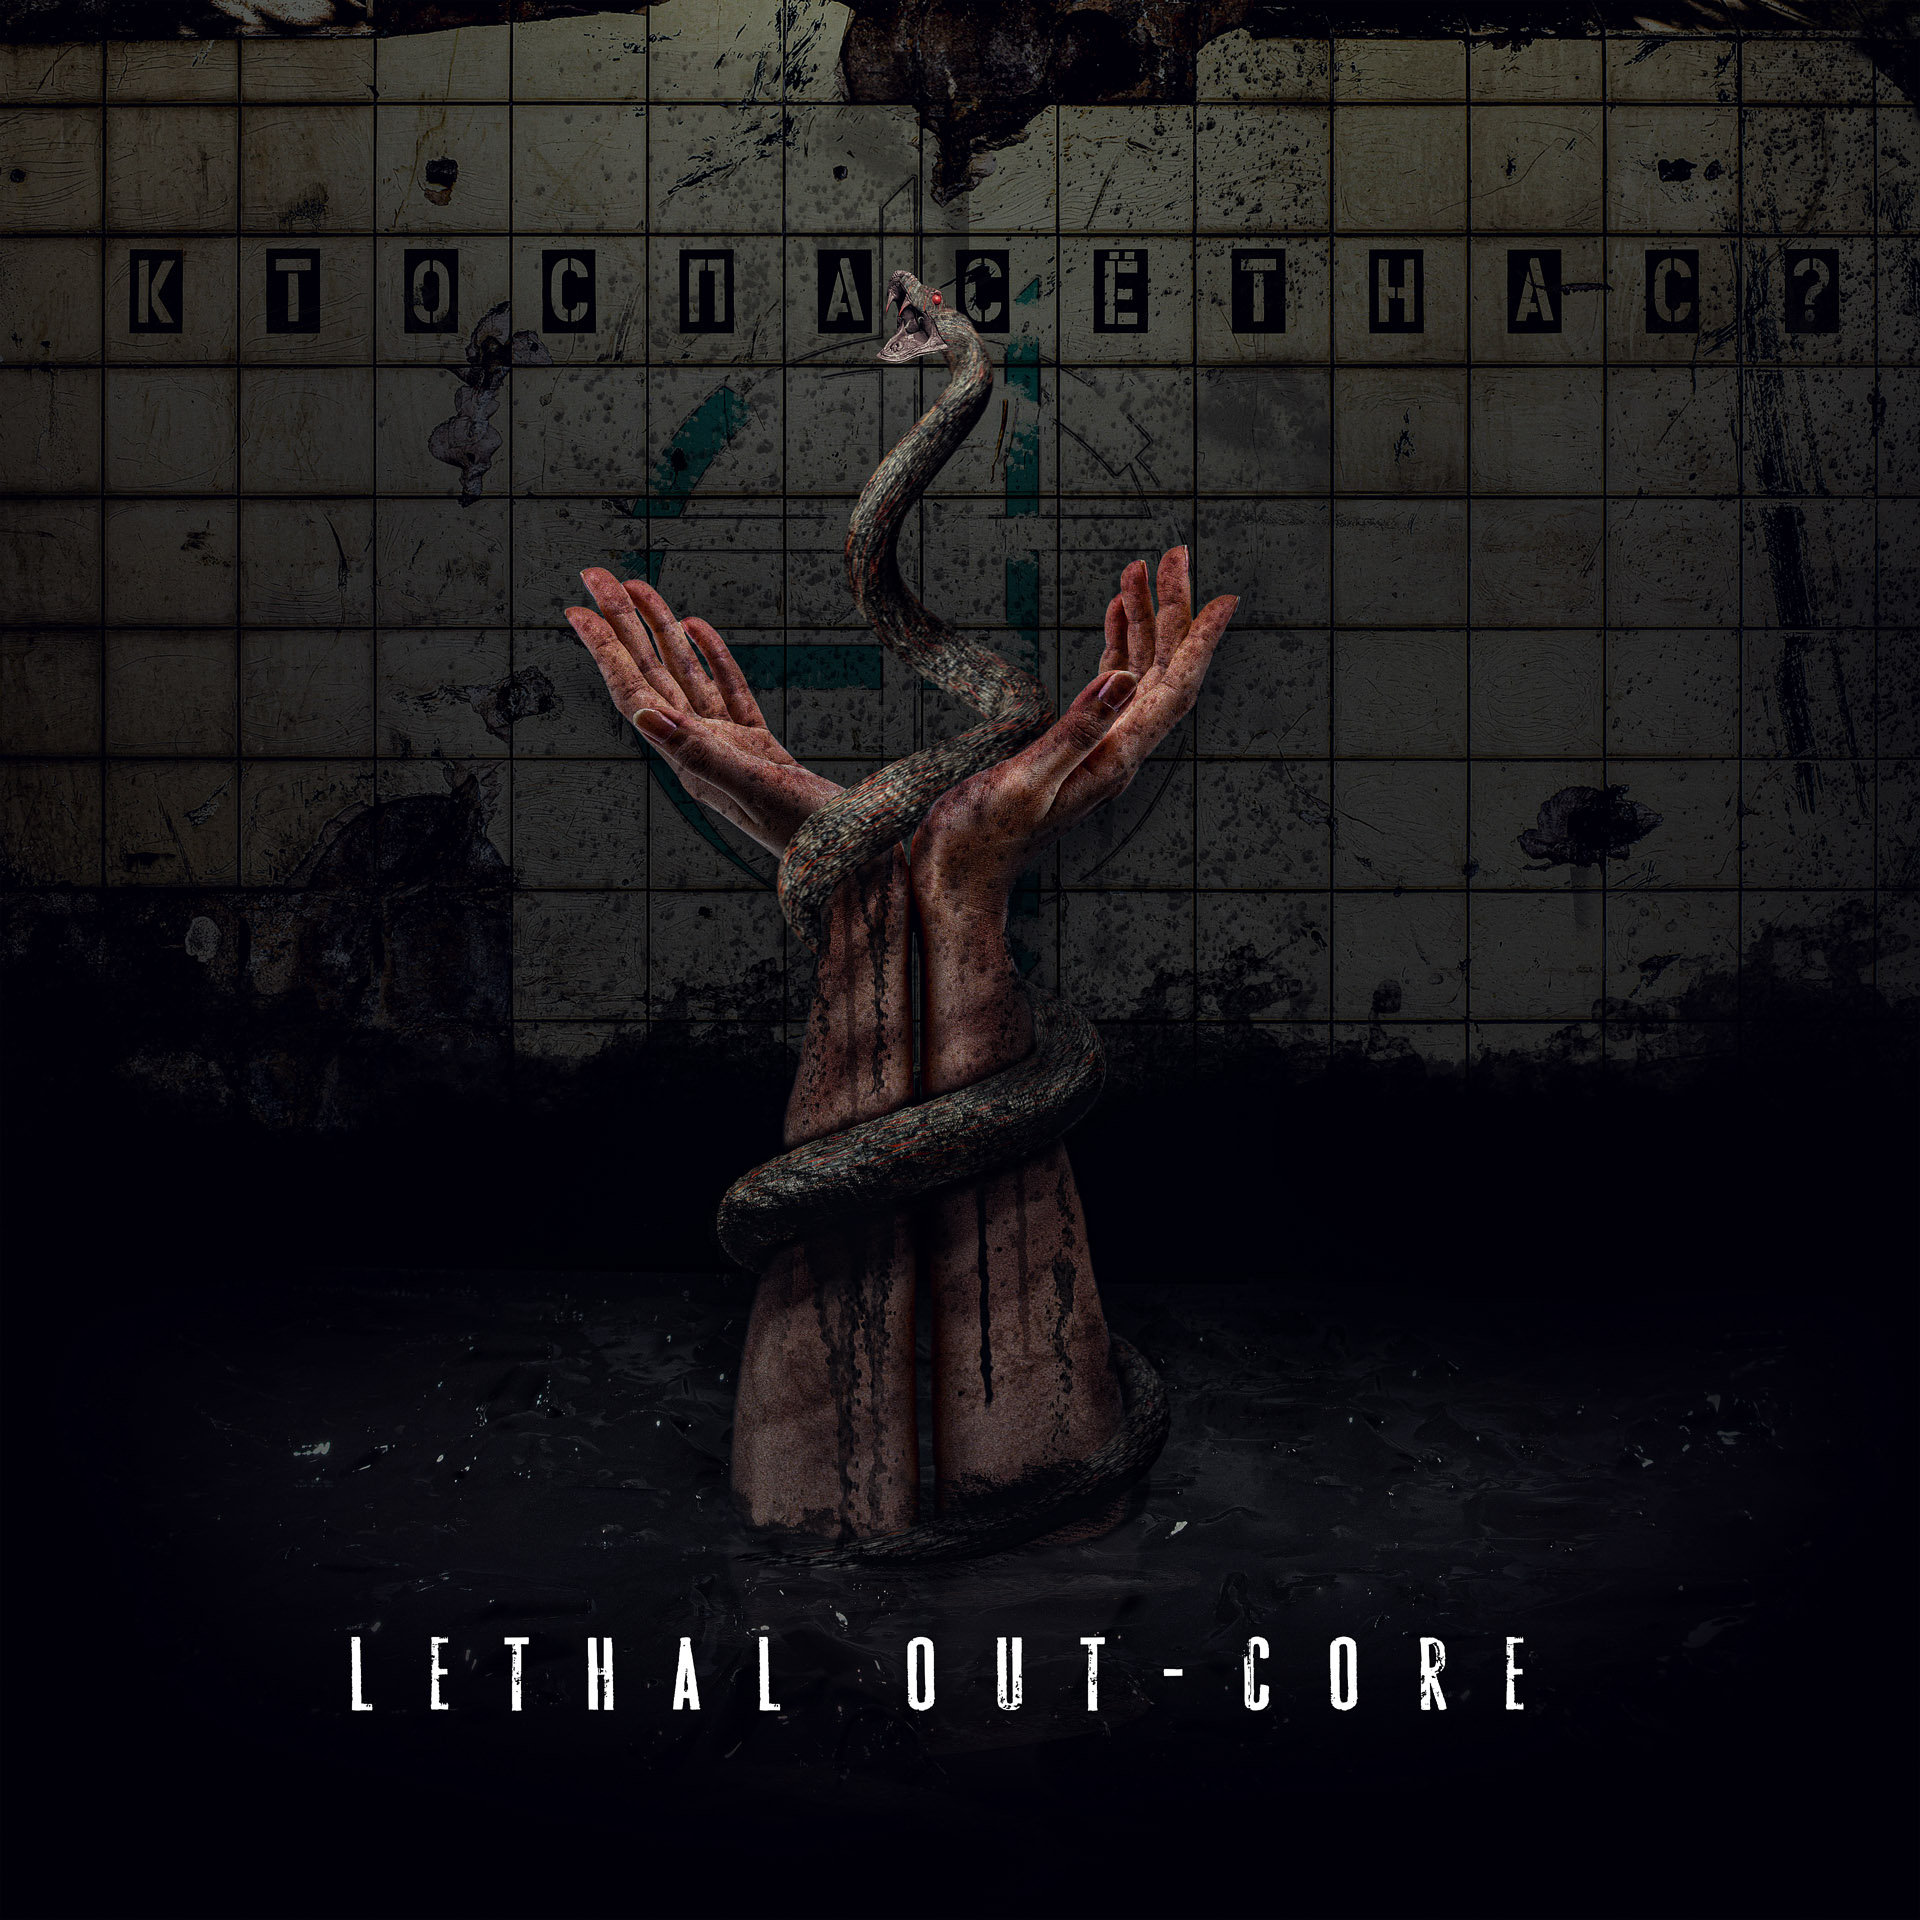 Обложка для трека Lethal Out-Core - Кто спасёт нас?